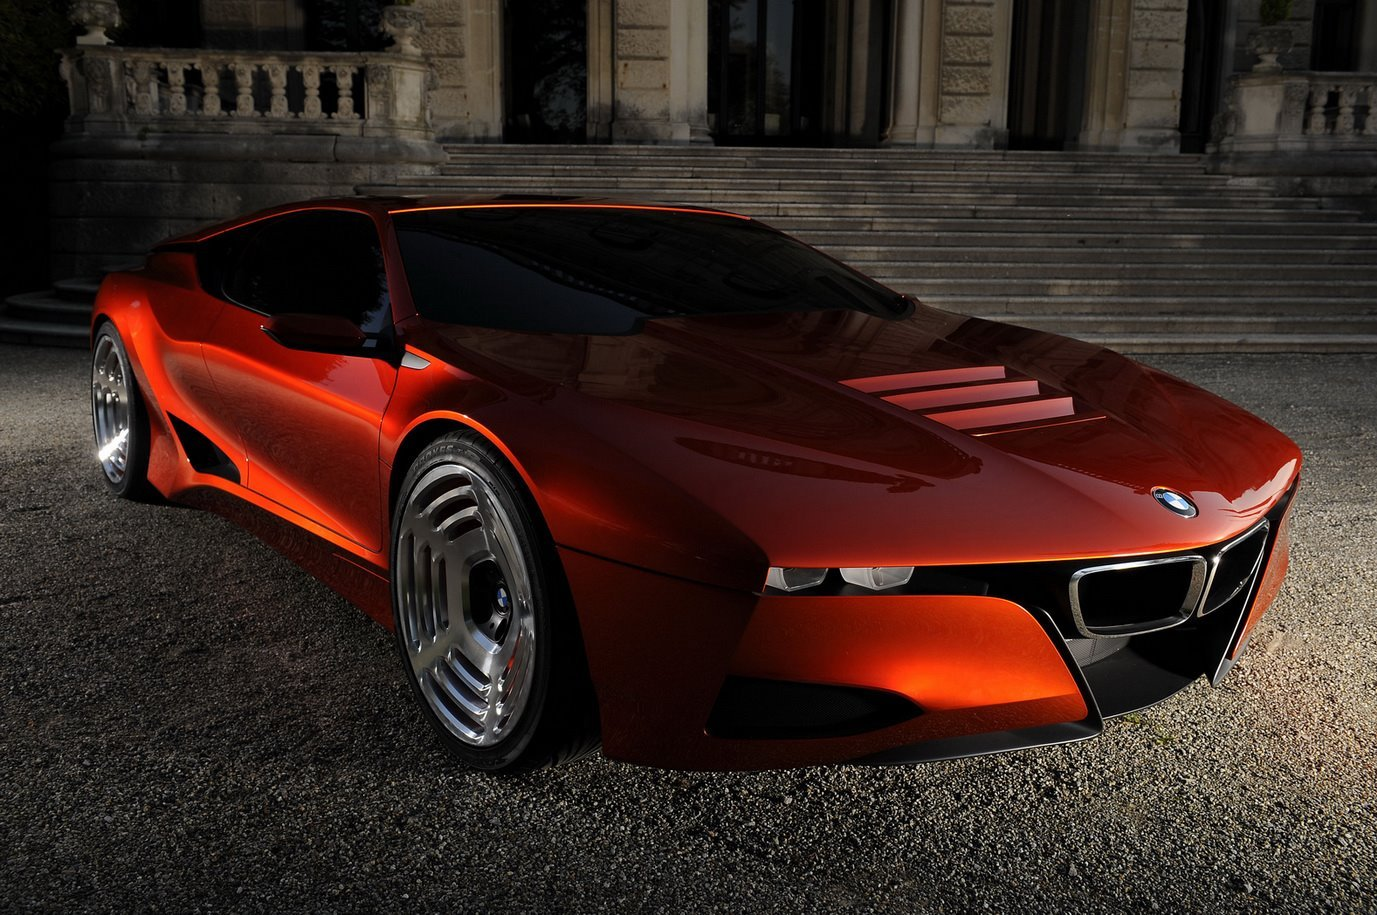 bmw m1 concept cars - photo #7